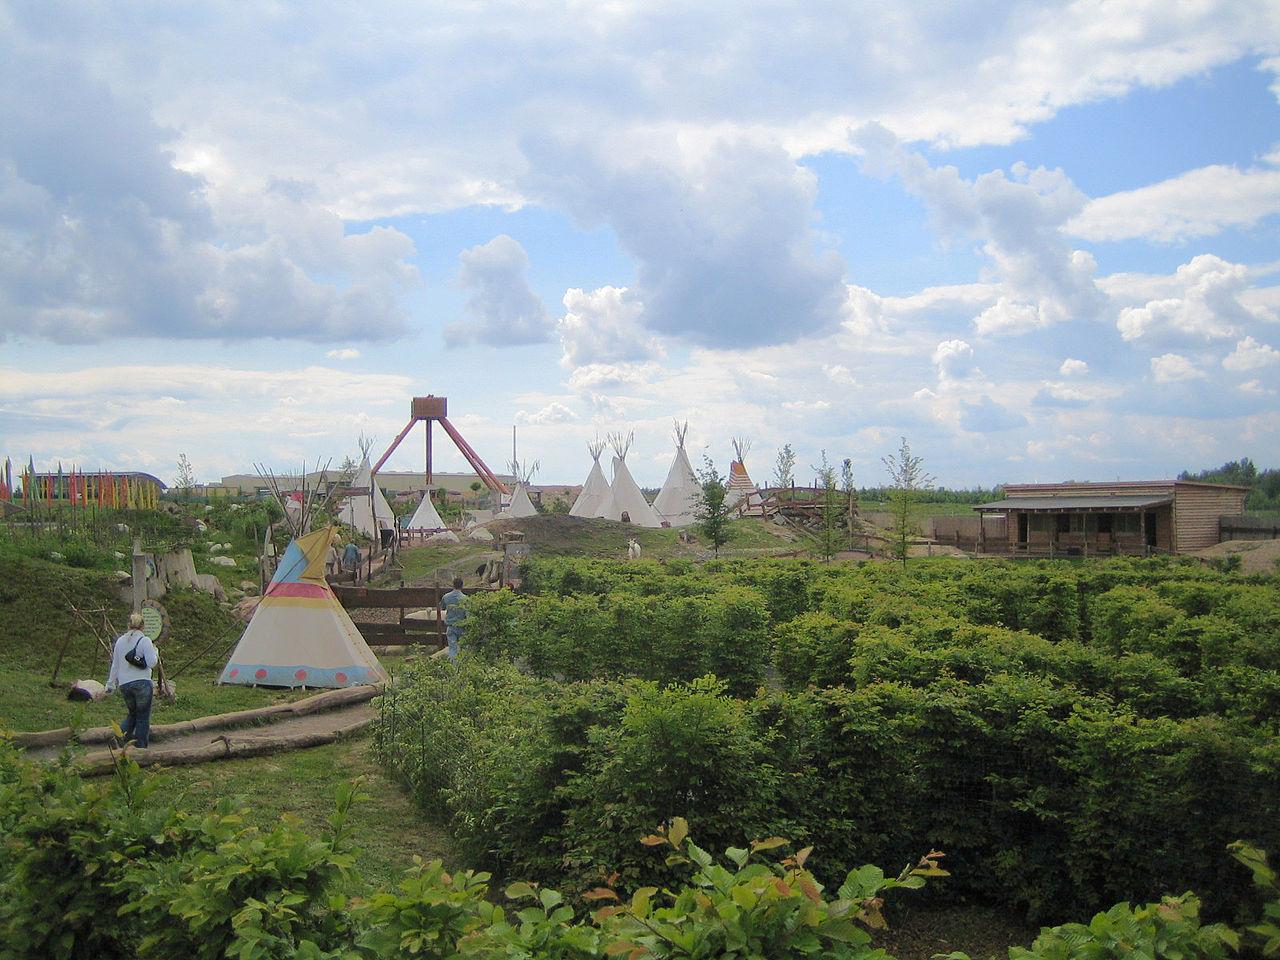 Leipzig –  Belantis Freizeitpark oder Zoo am 15.08.2020